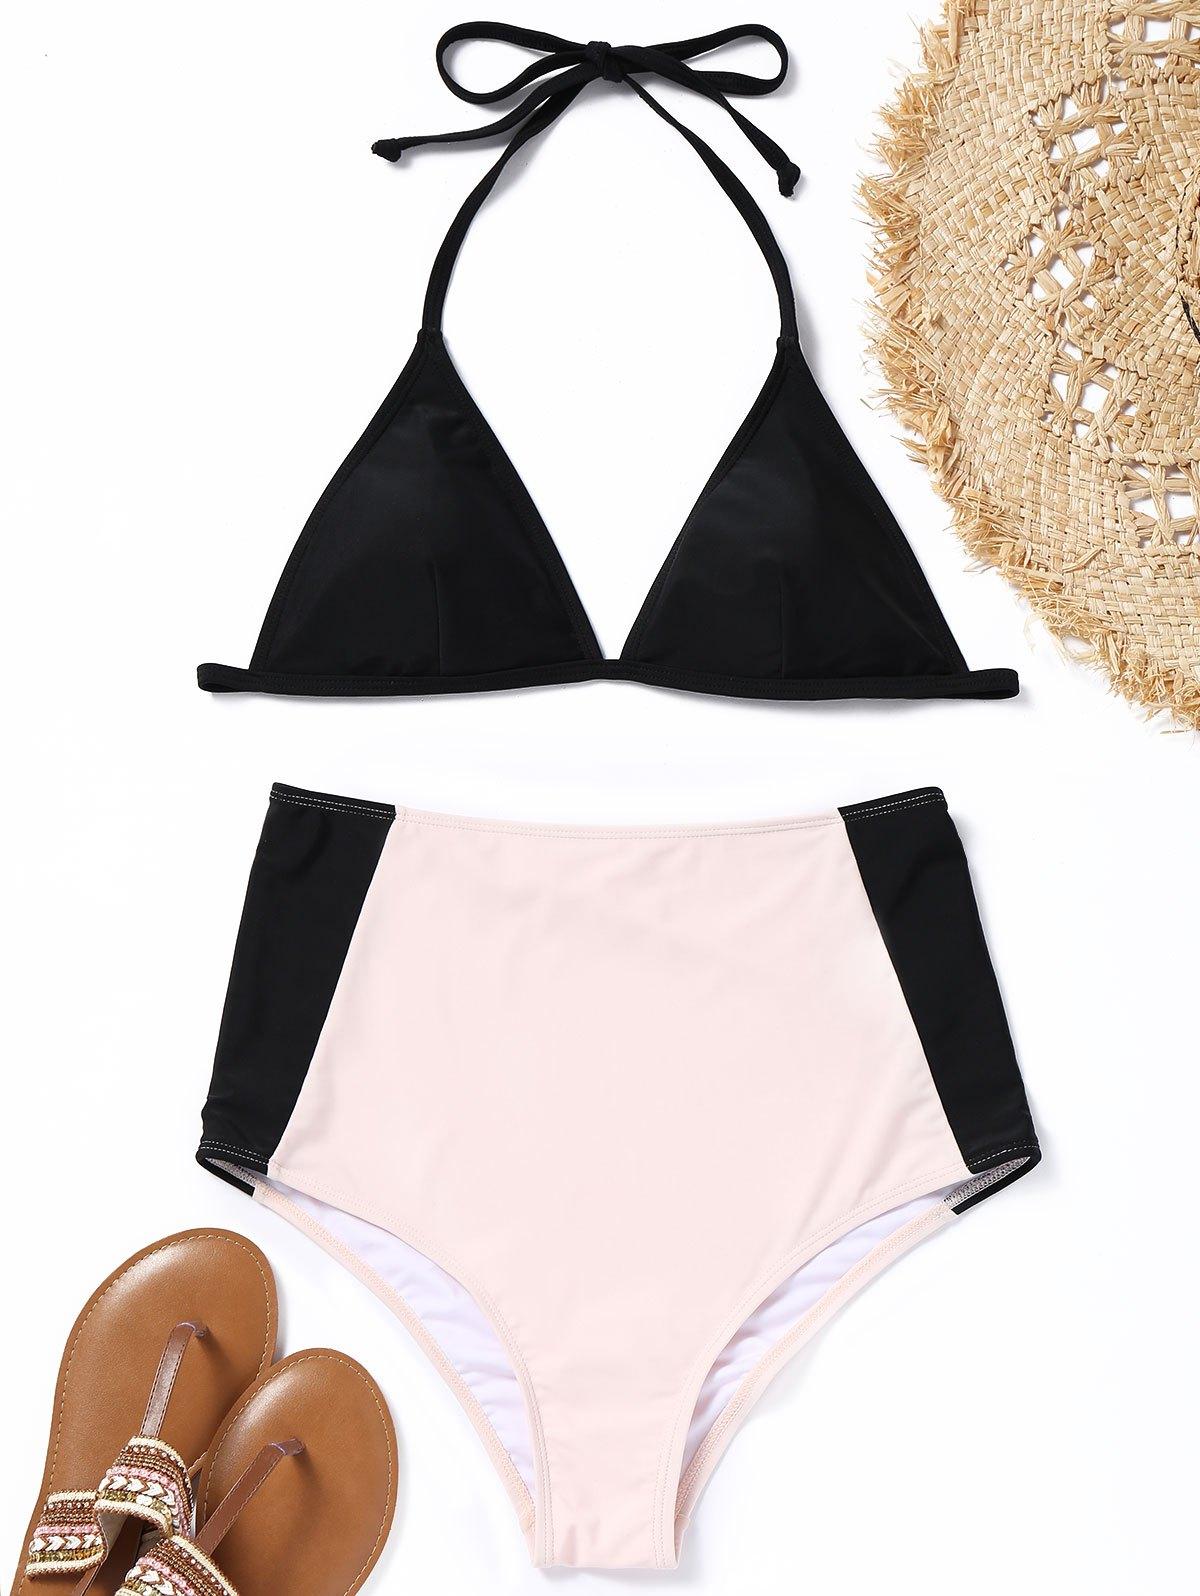 Padded Two Tone High Waisted Bikini Set 238194002